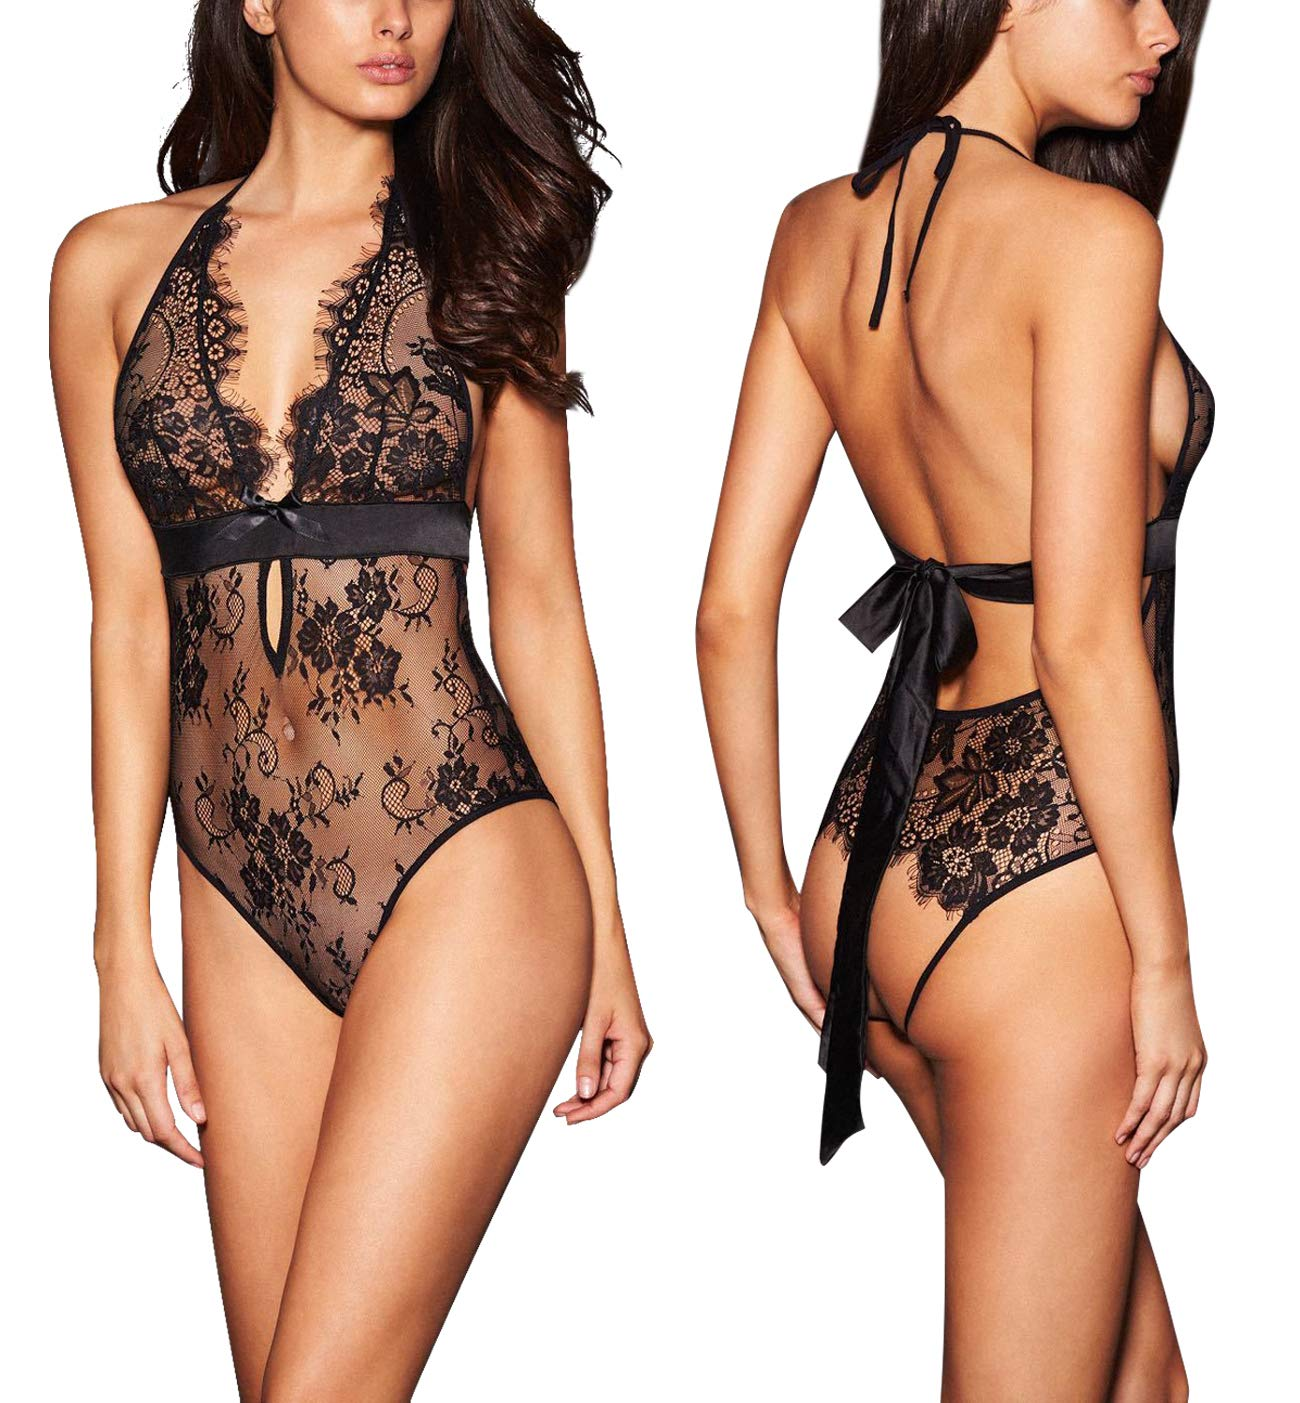 ba74bbb6a0f Galleon - ALLoveble Women Lace Babydoll Teddy Underwear Black (XL ...